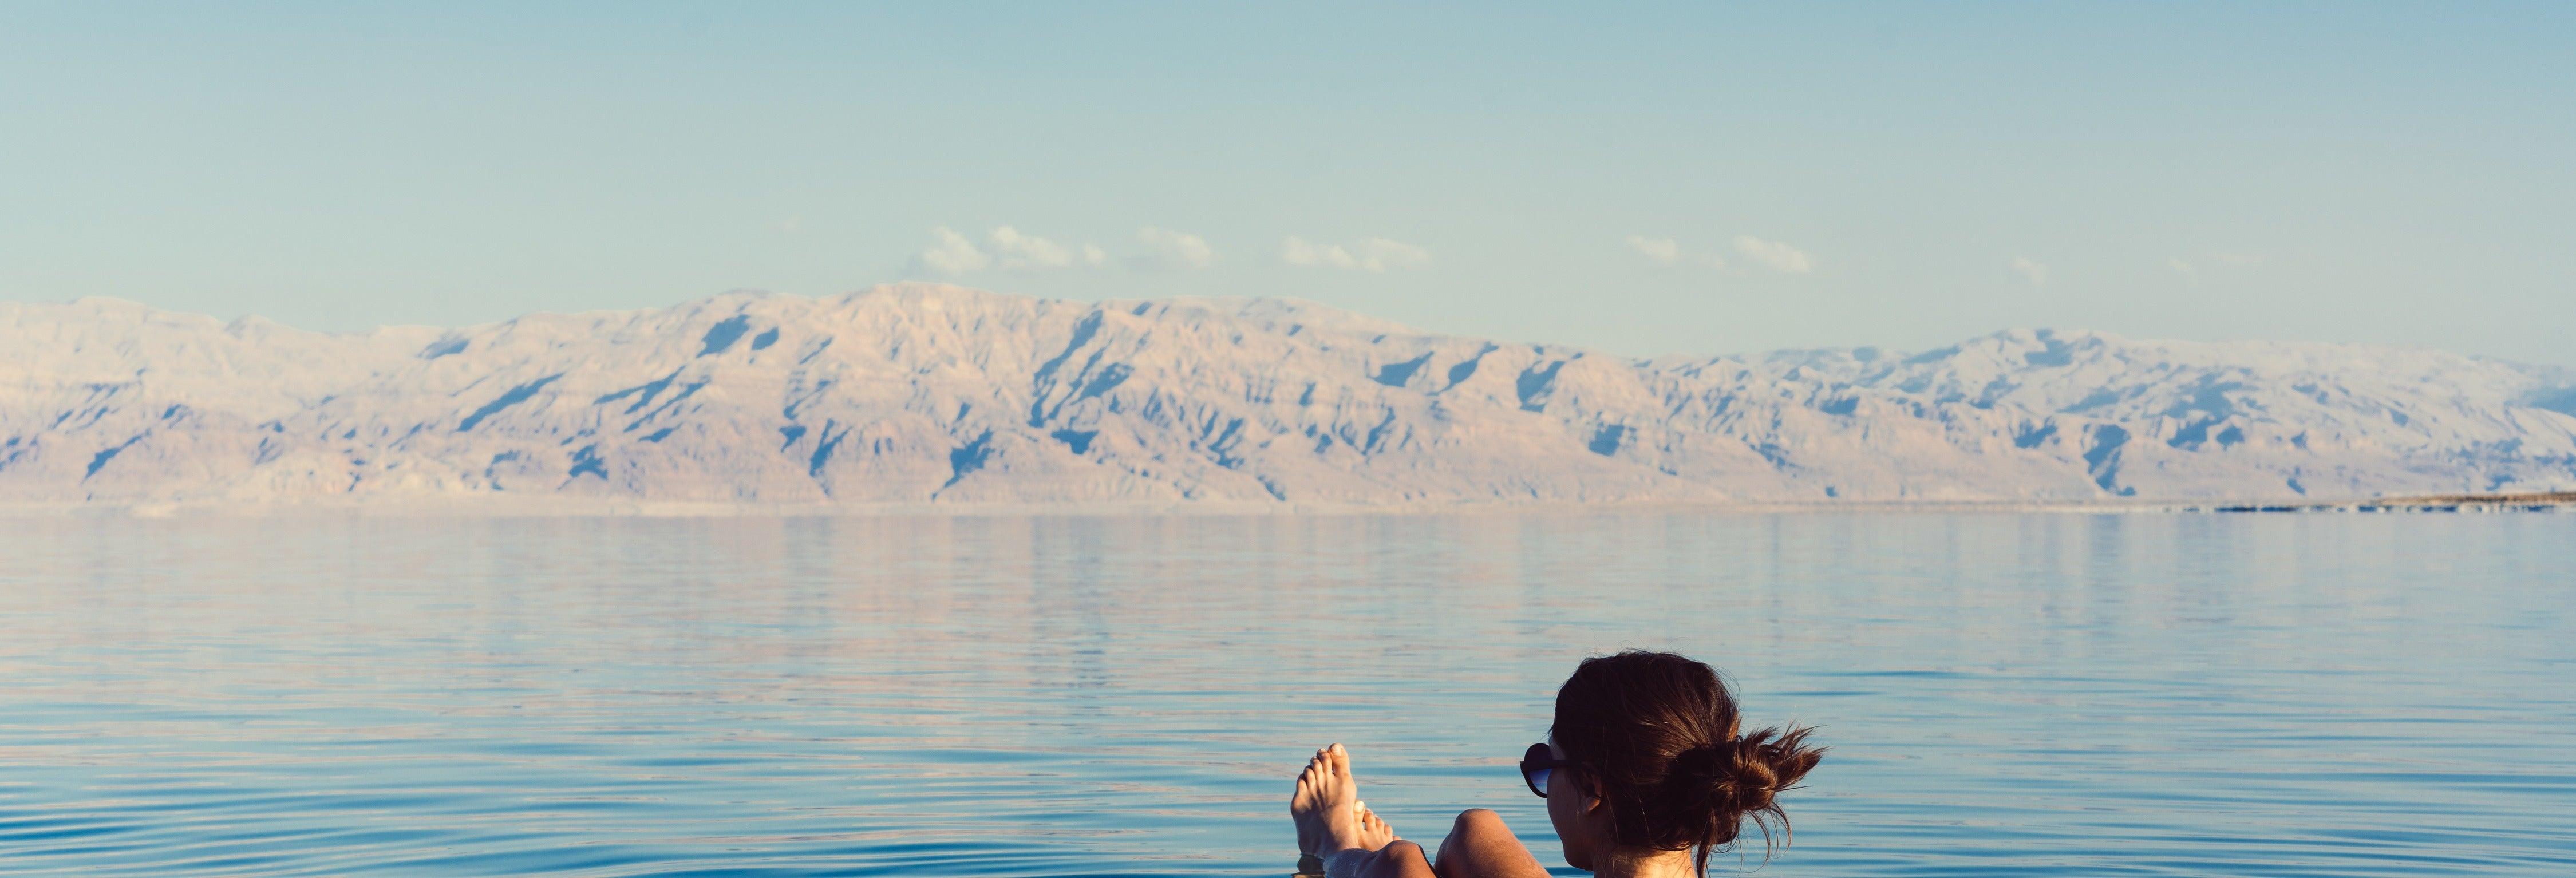 Madaba, Mount Nebo & Dead Sea Tour